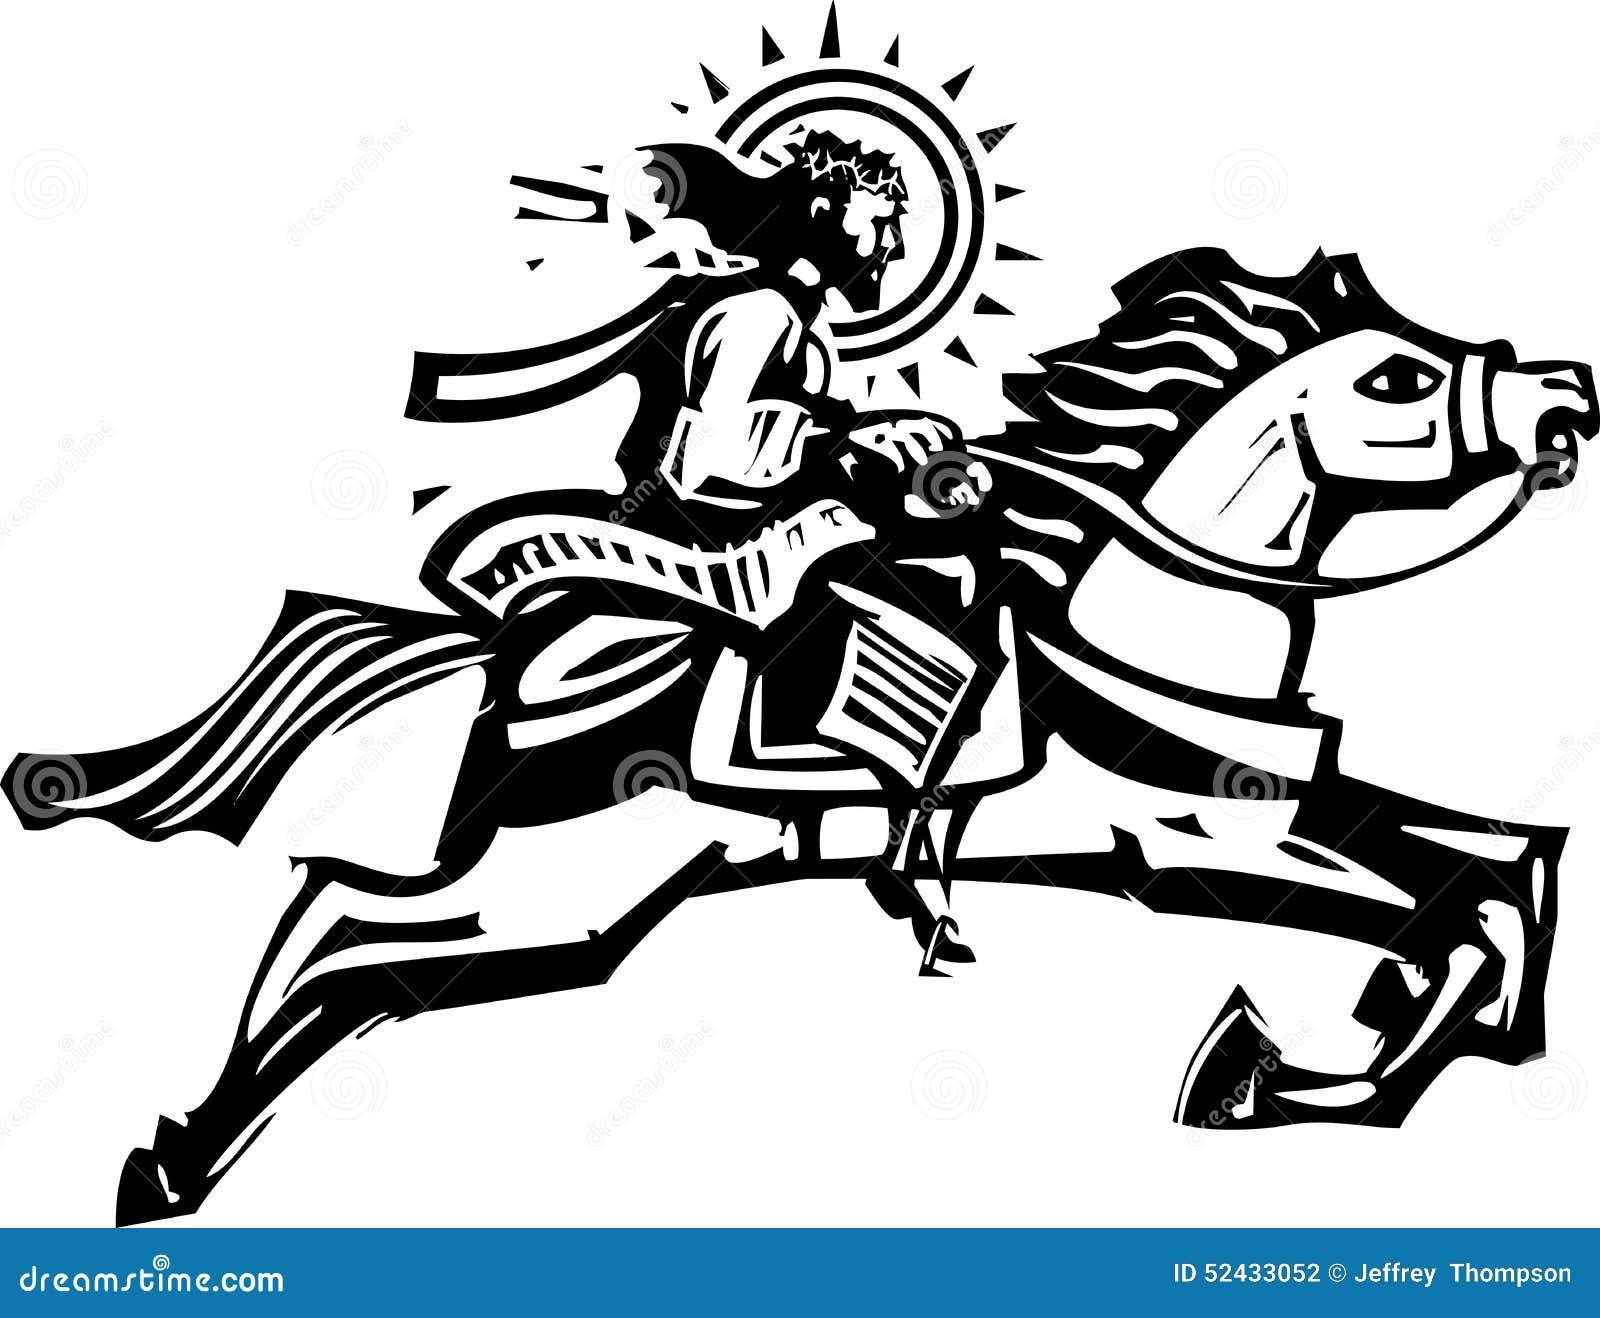 Jesus White Horse Stock Illustrations 56 Jesus White Horse Stock Illustrations Vectors Clipart Dreamstime